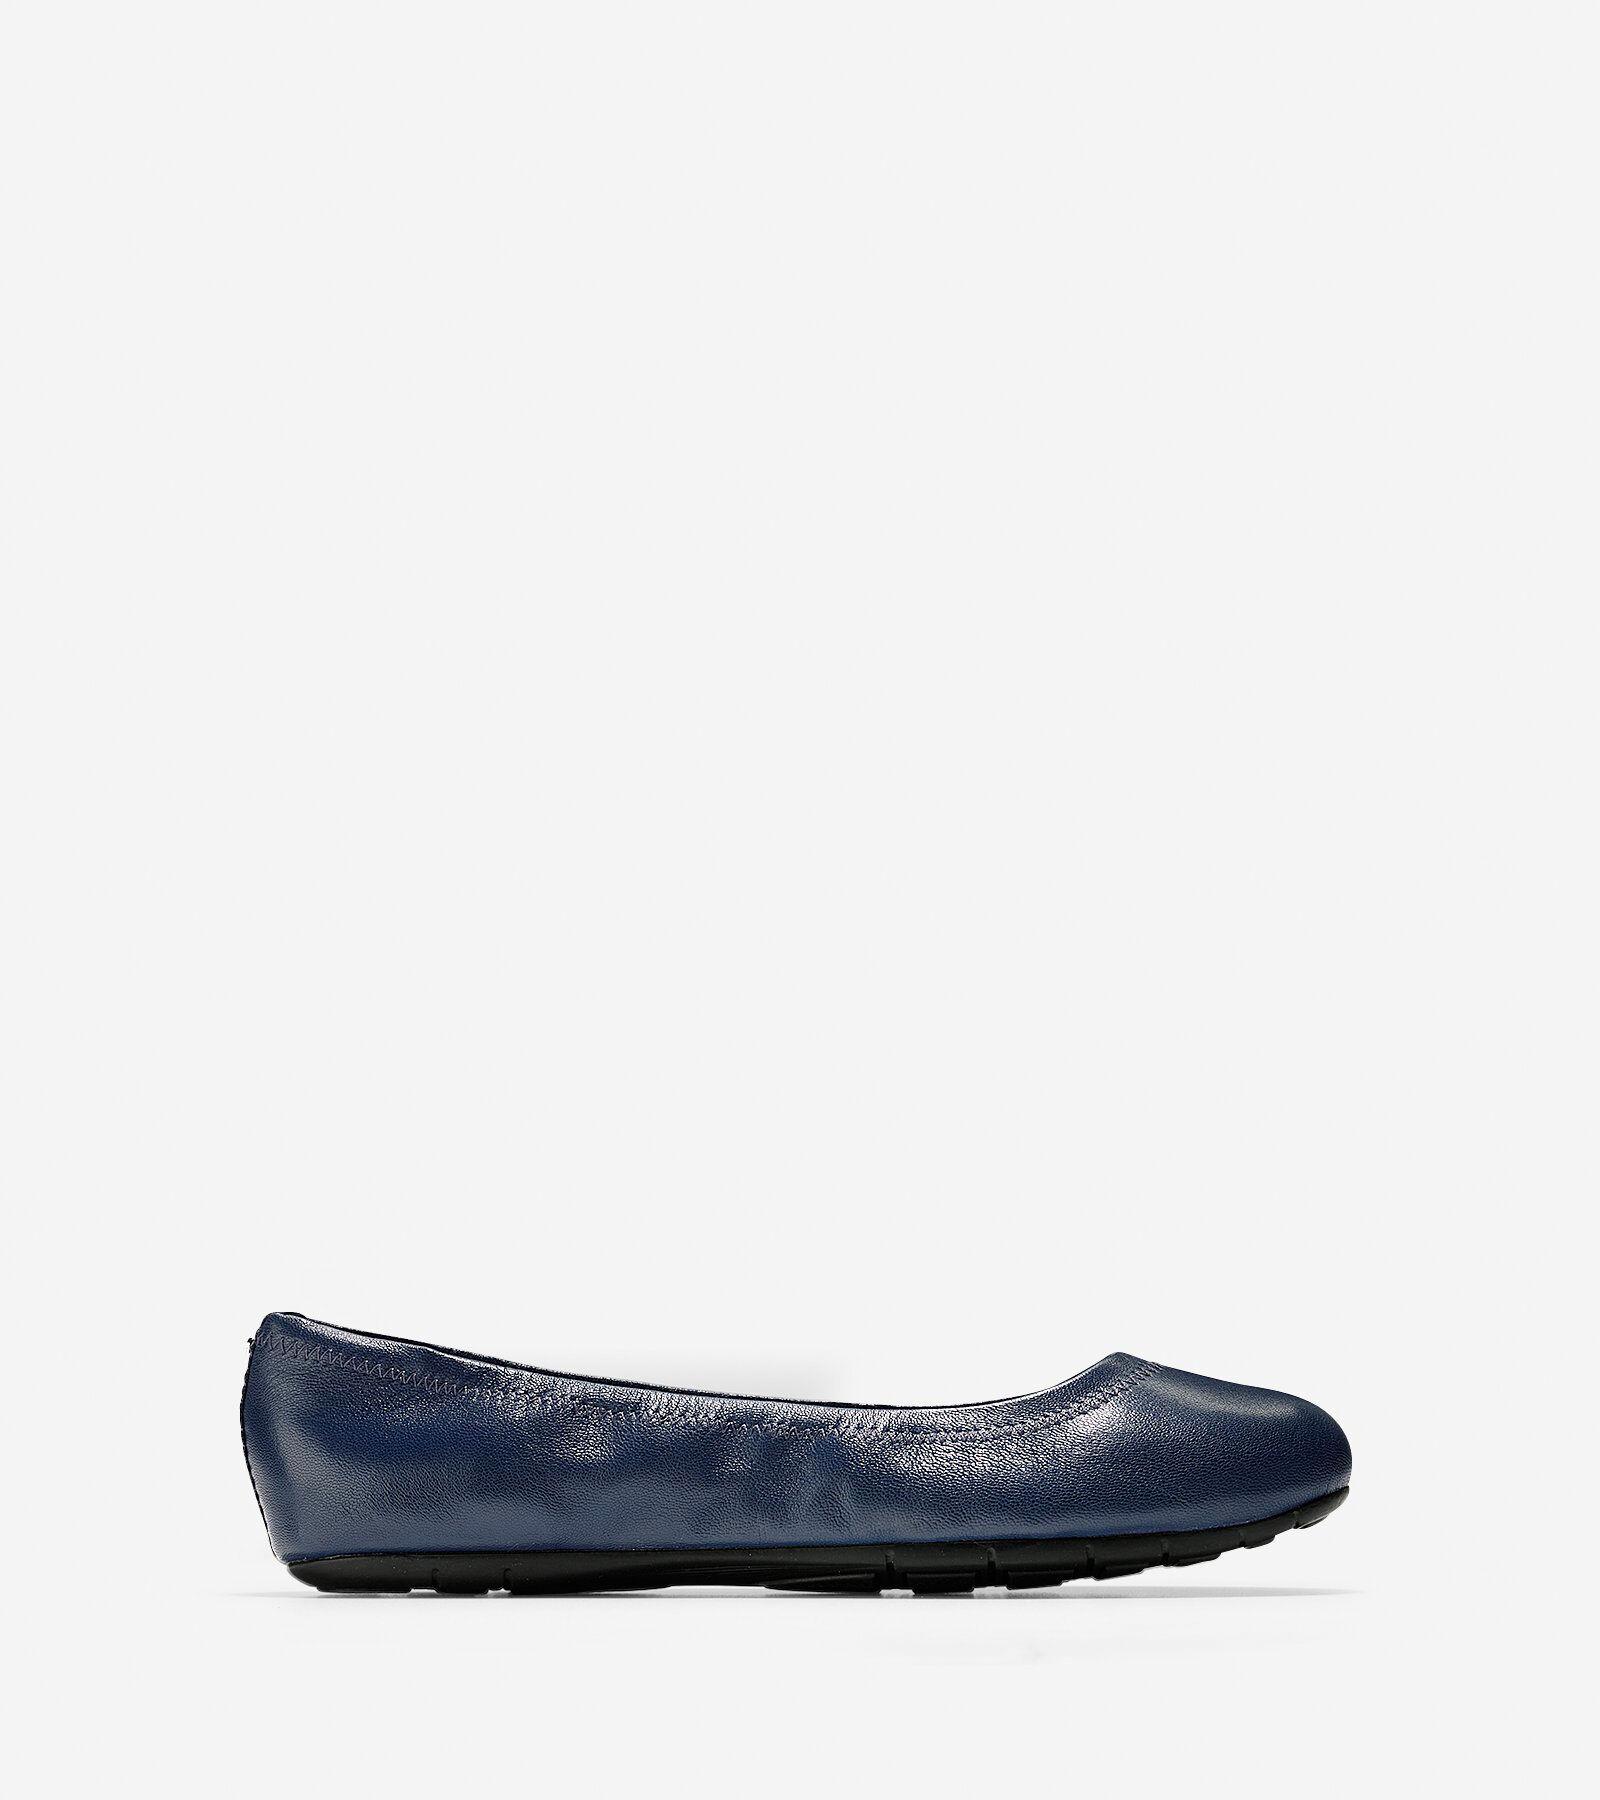 ZEROGRAND Ballet Flats in Blazer Blue